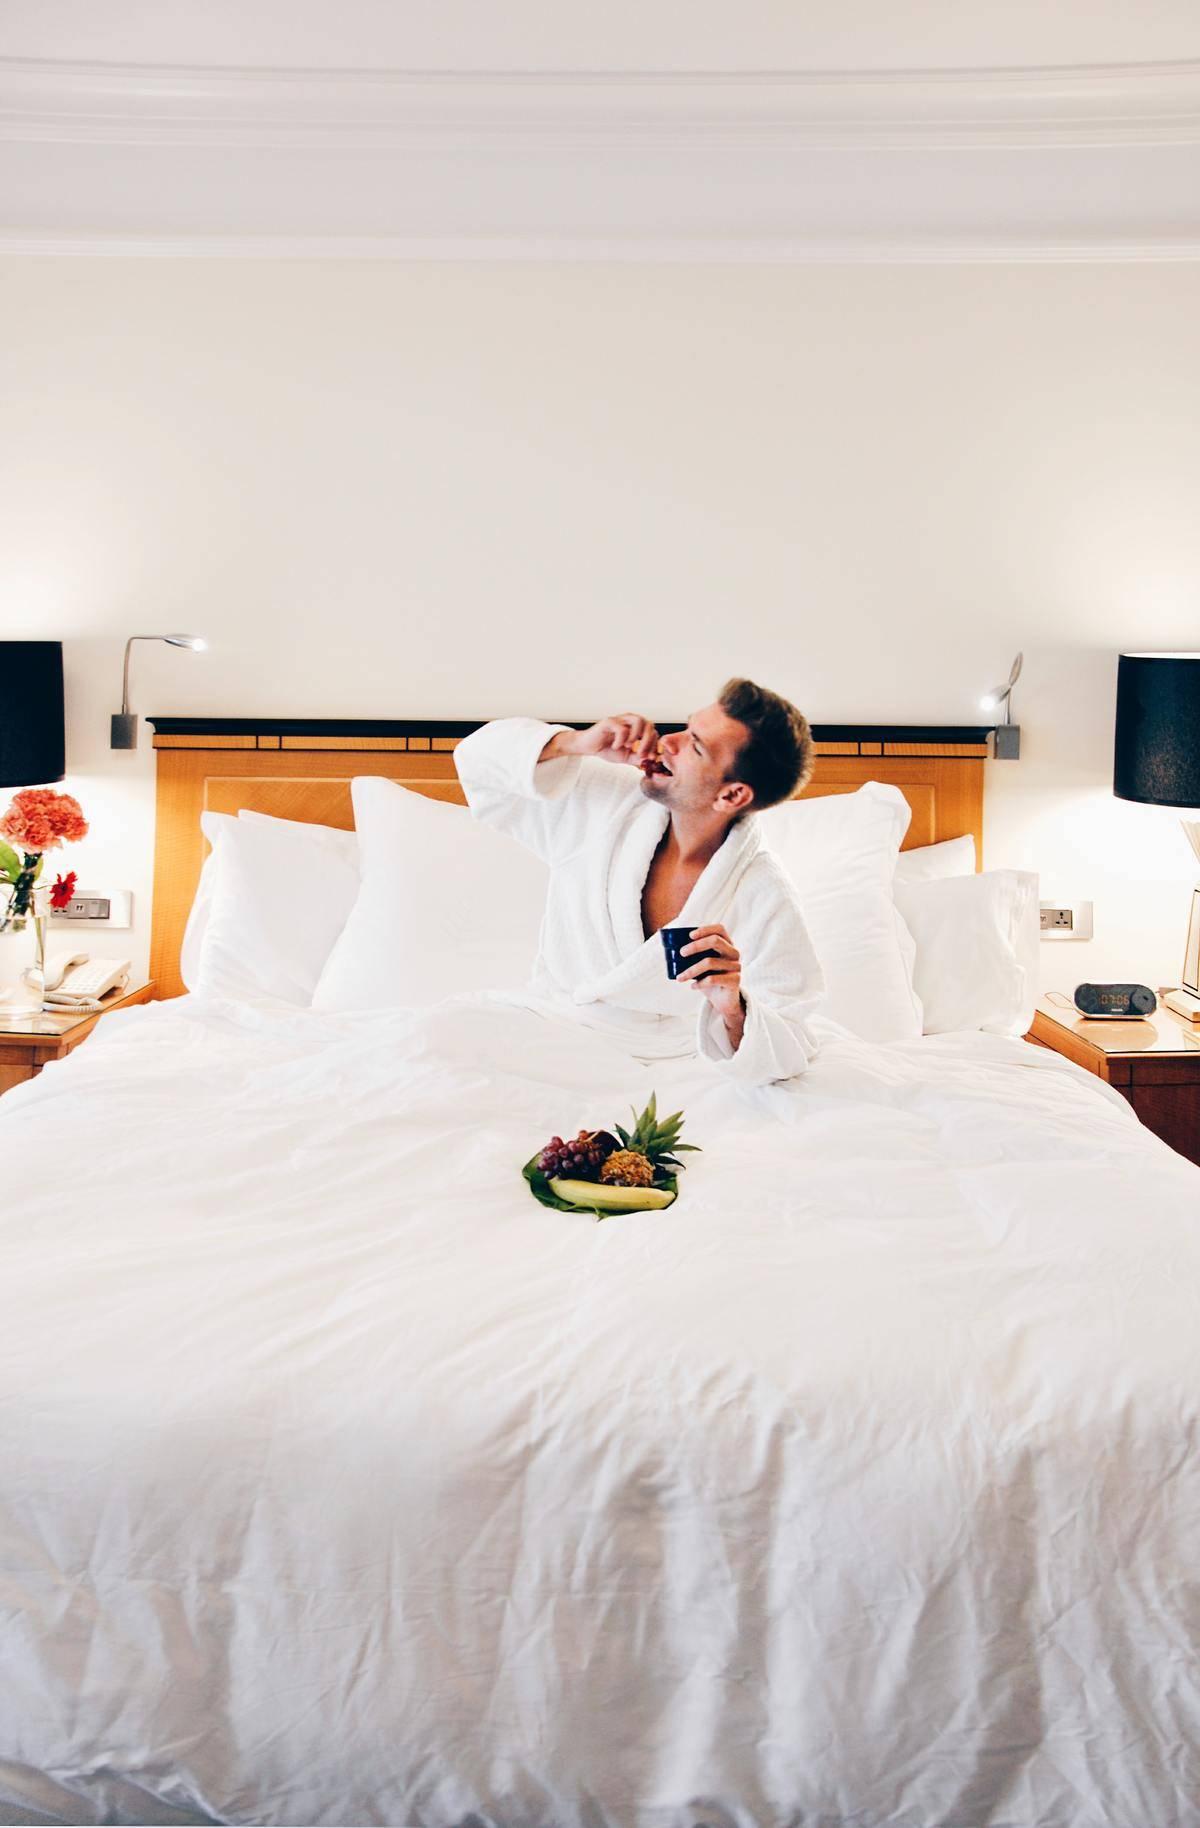 man in hotel bed eating fruit